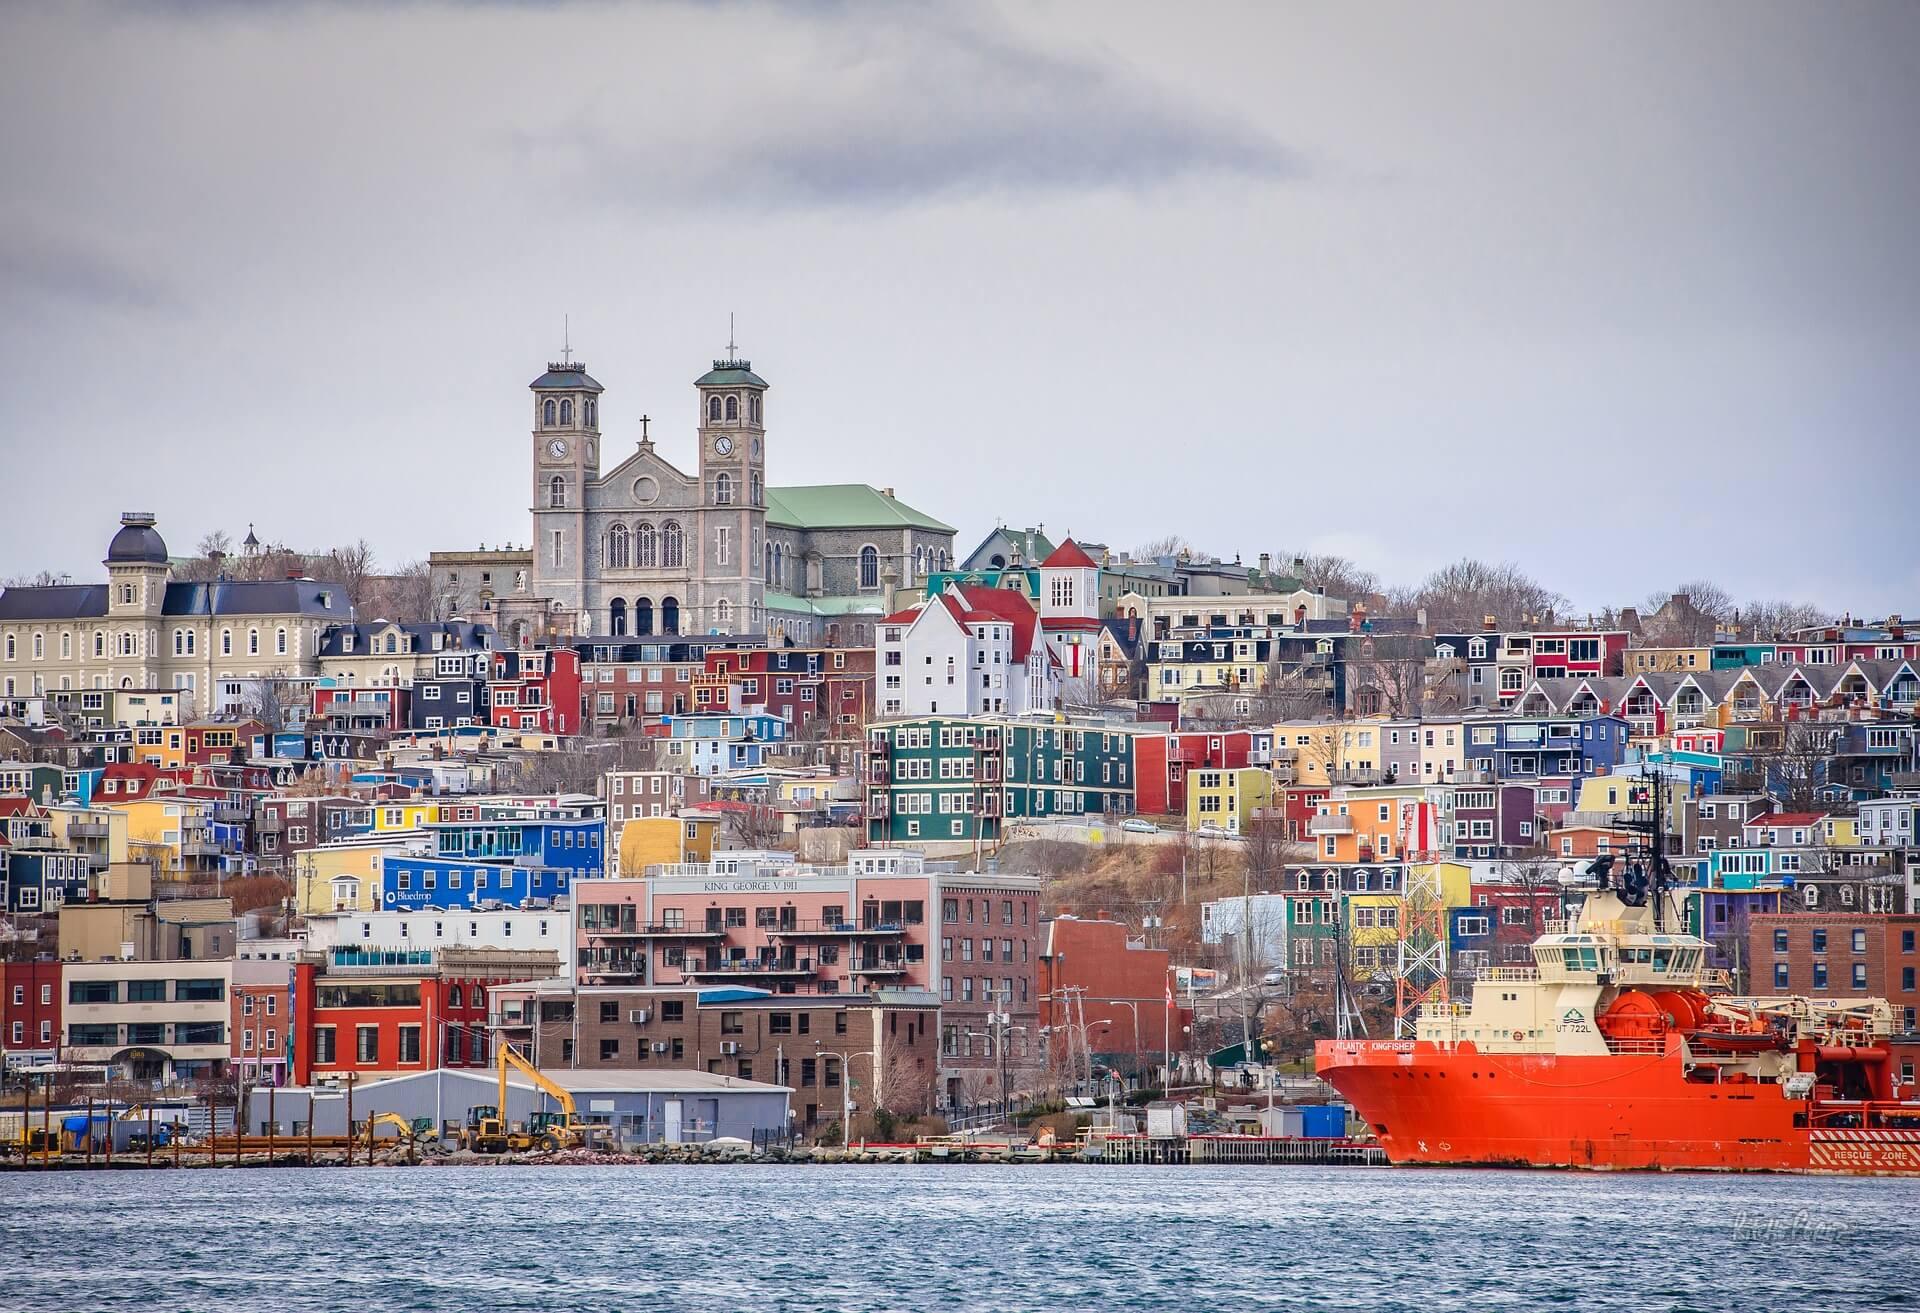 Newfoundland architecture